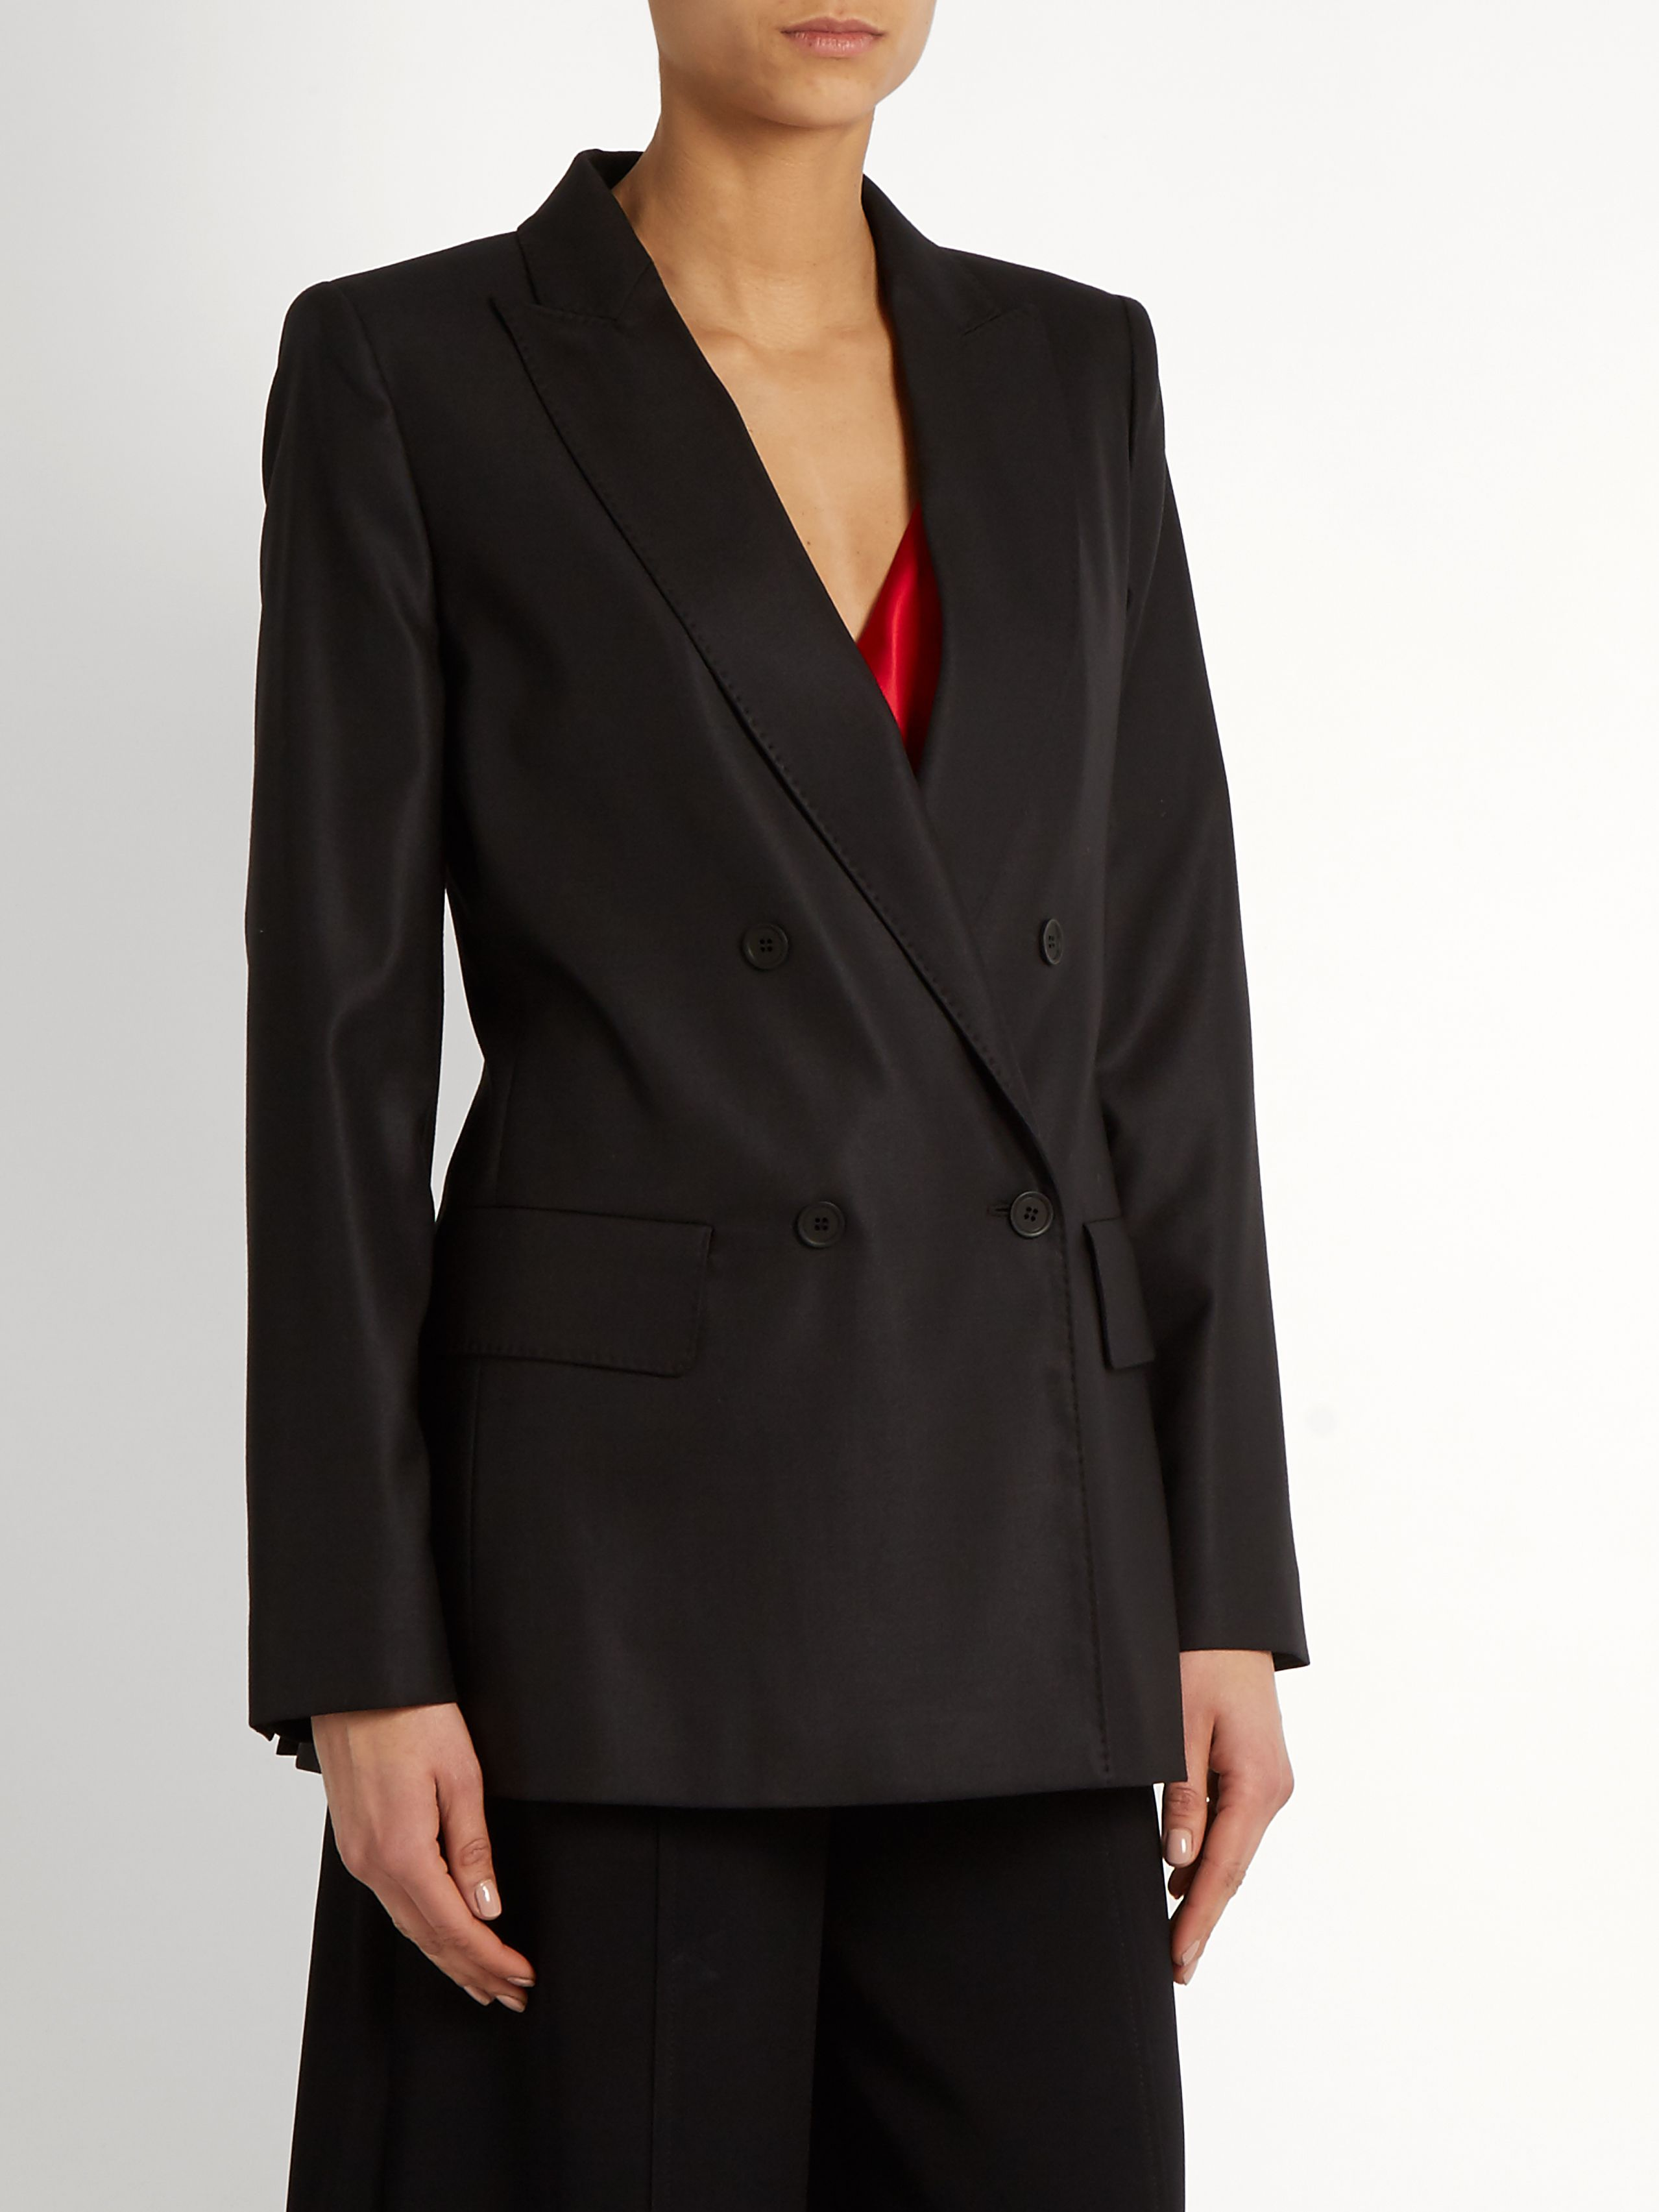 3bfa0079036b8 Click here to buy Max Mara Marlo jacket at MATCHESFASHION.COM